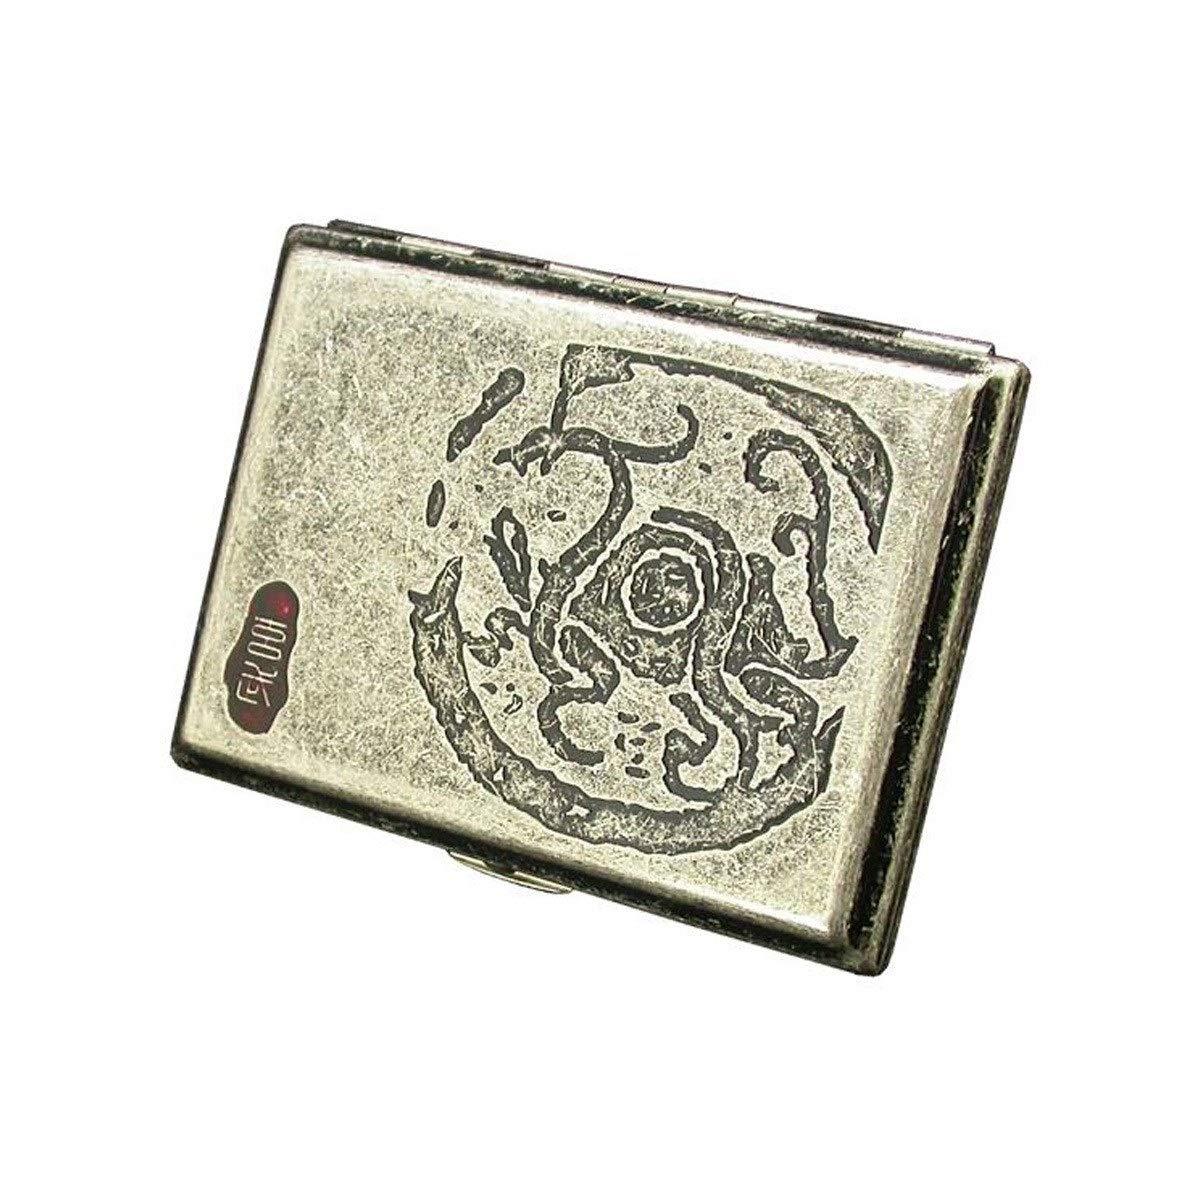 WalledKing Cigarette Case 16 Sticks, Portable Simple Retro Cigarette Case Creative Retro Copper, Ancient Beast, Suzaku, Qinglong White Tiger, Xuanwu Cigarette Case, Is The Ideal Gift For Smokers Smoke